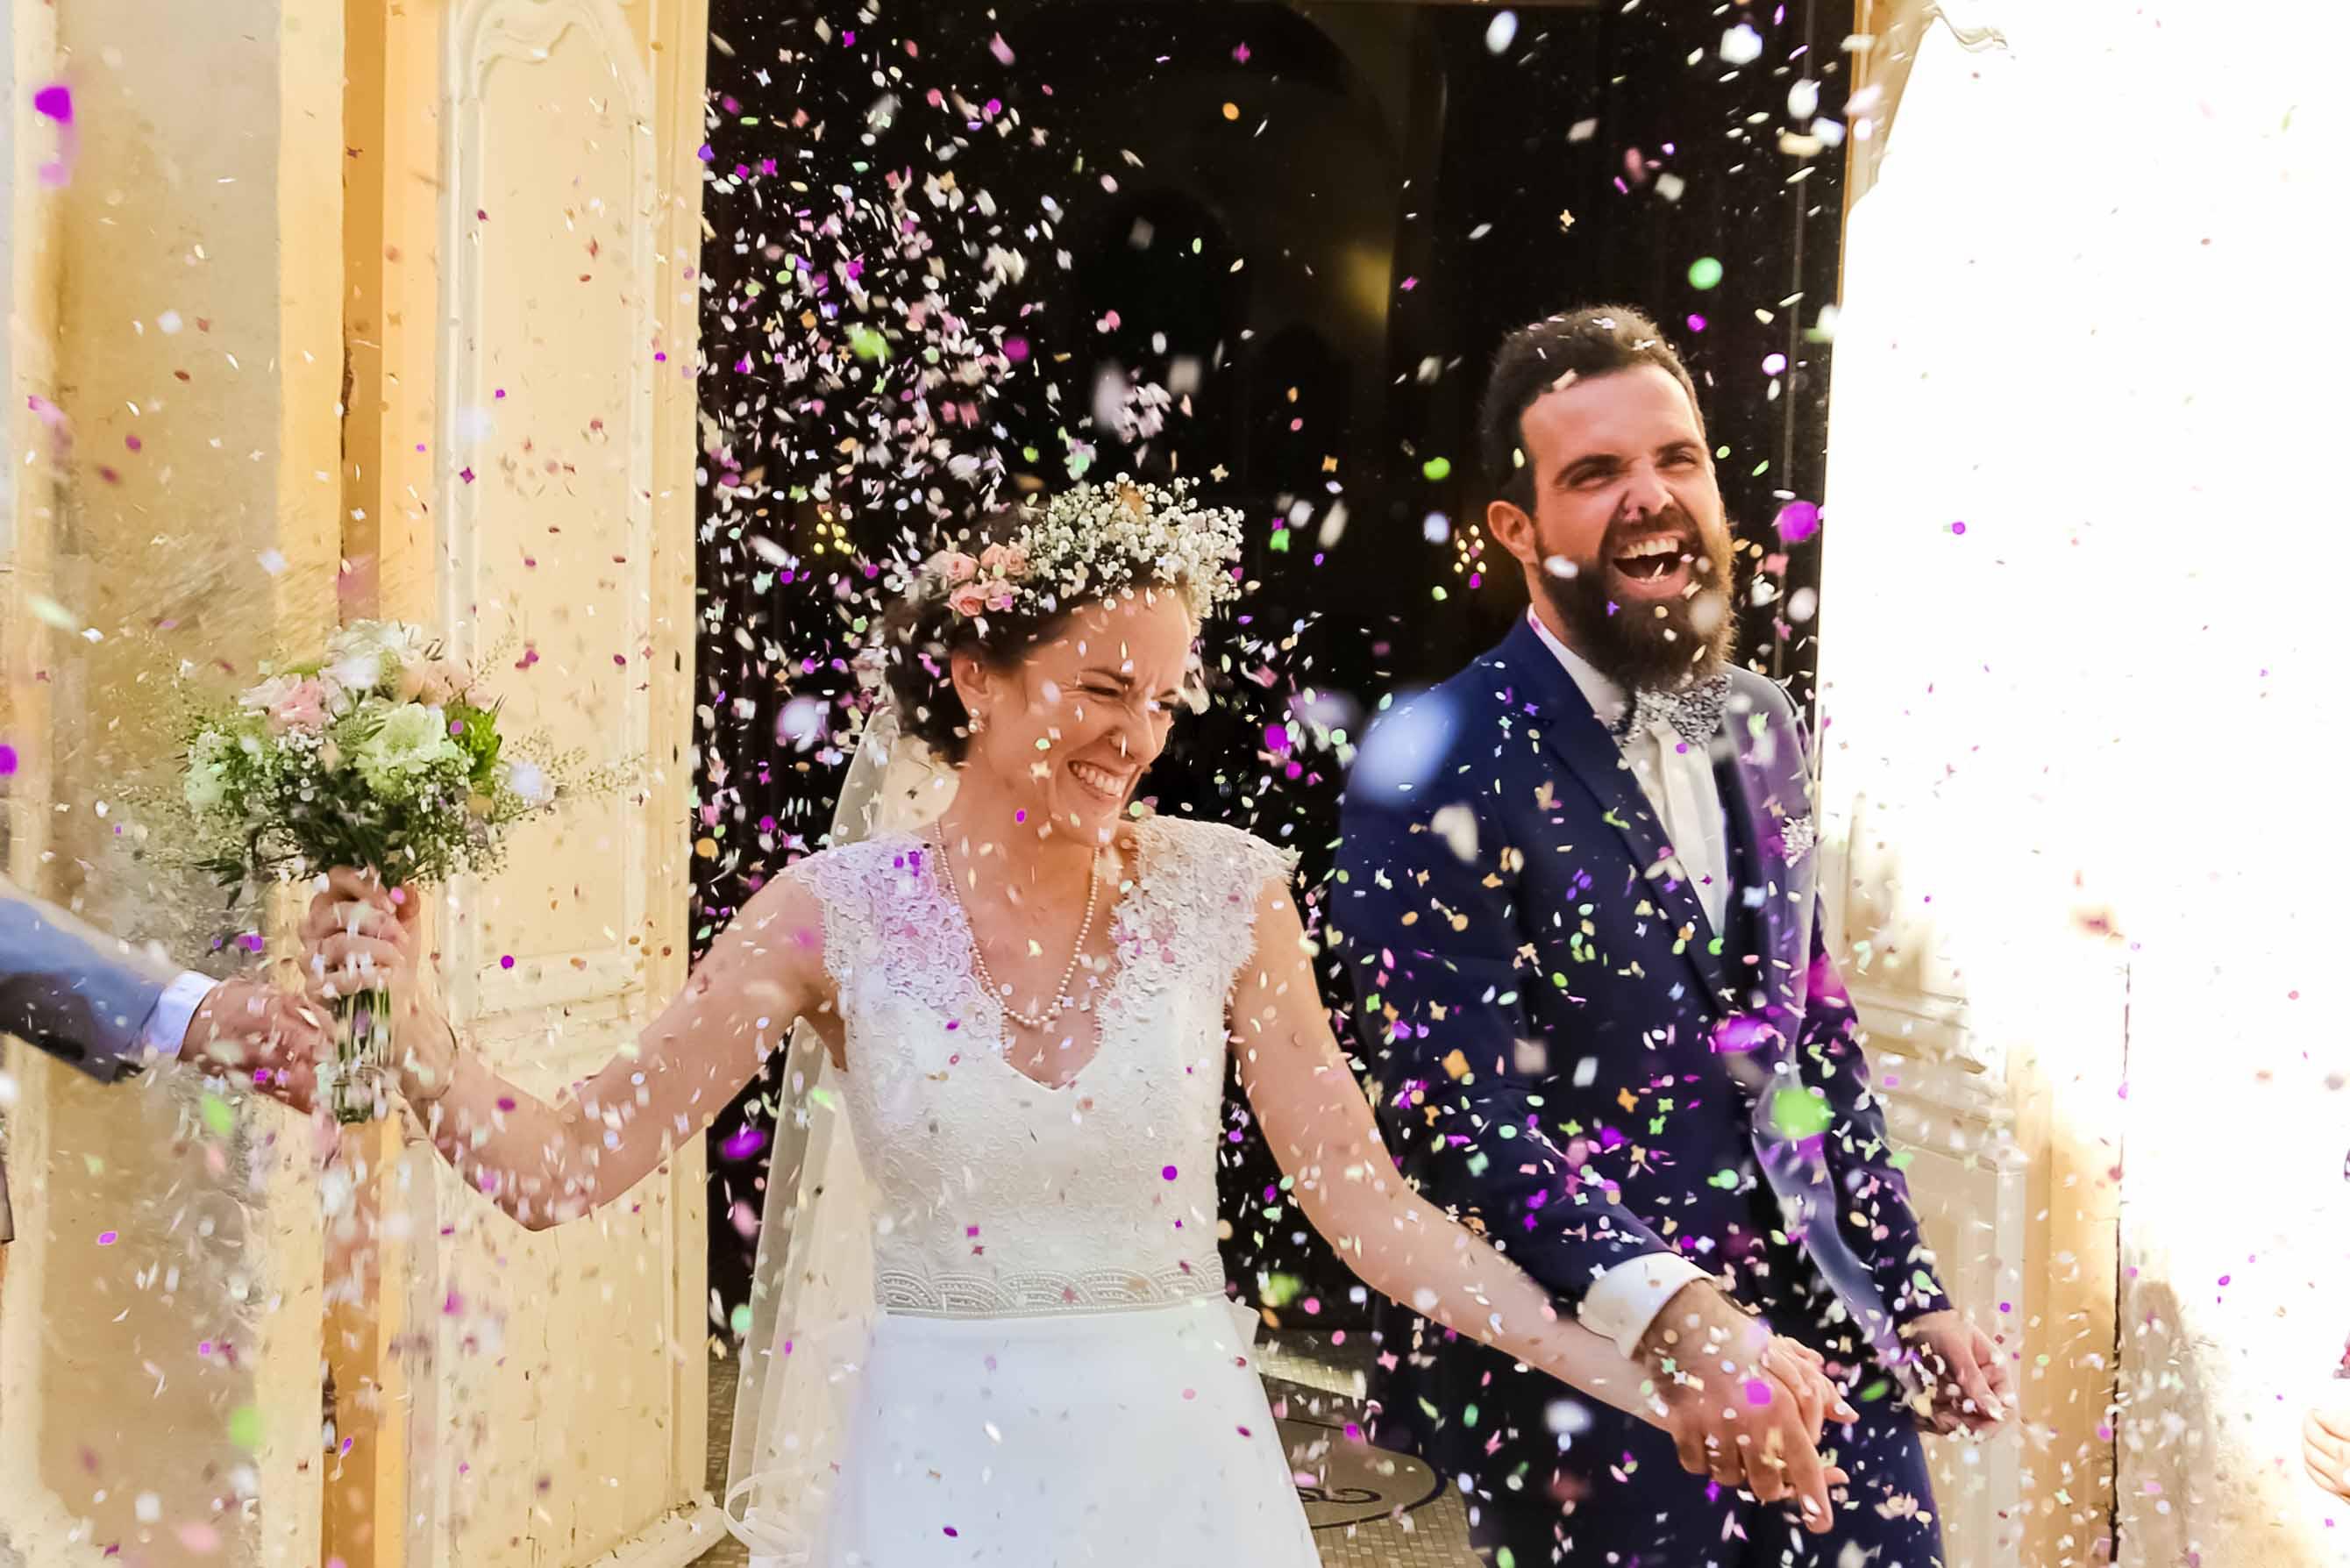 Sortie Eglise Couple Mariage